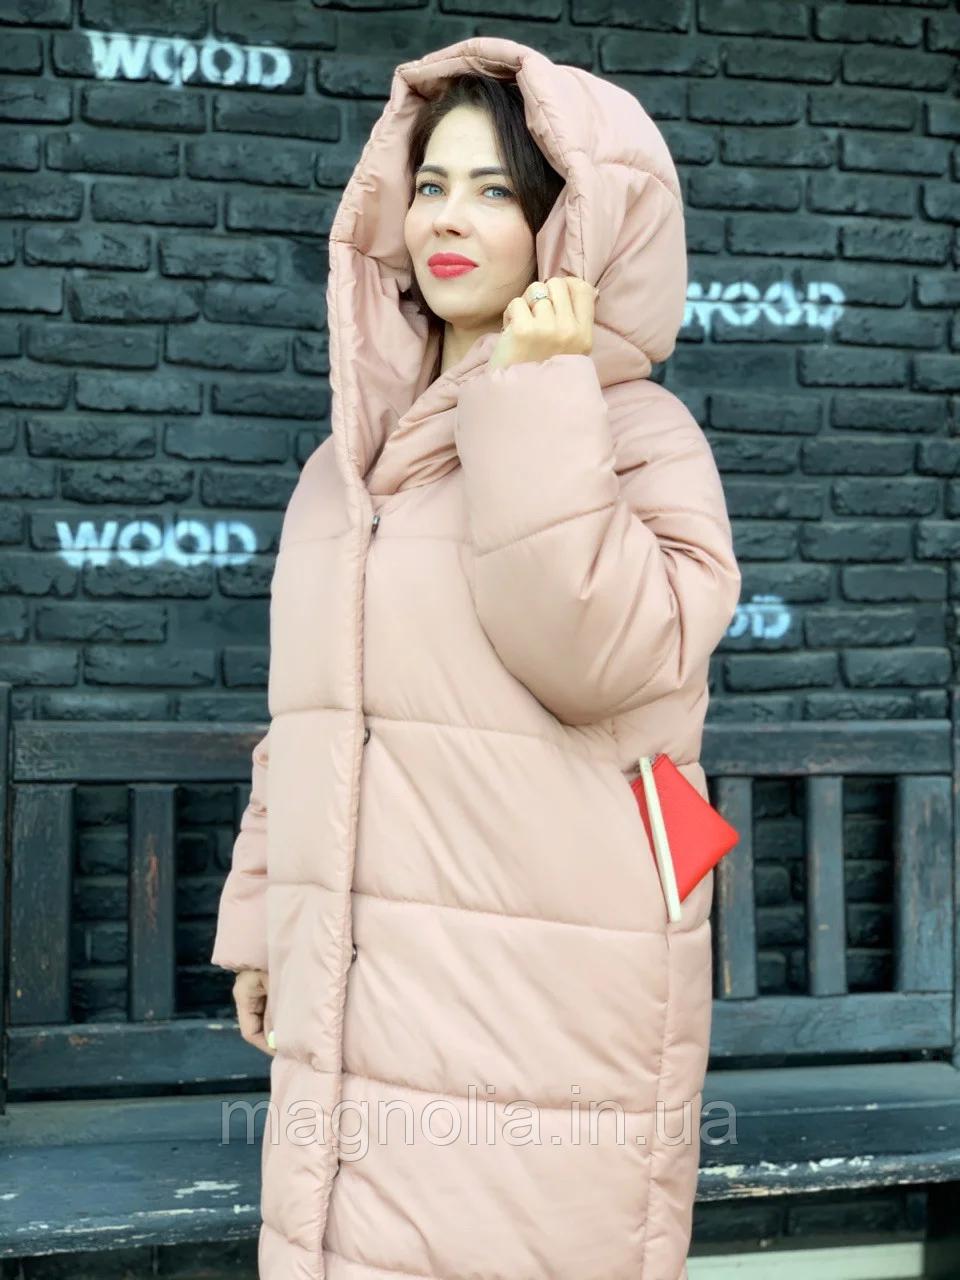 Зимняя теплая длинная  куртка пальто пуховик оверсайз одеяло с капюшоном плащевка + силикон ніжно розовий, 42-44